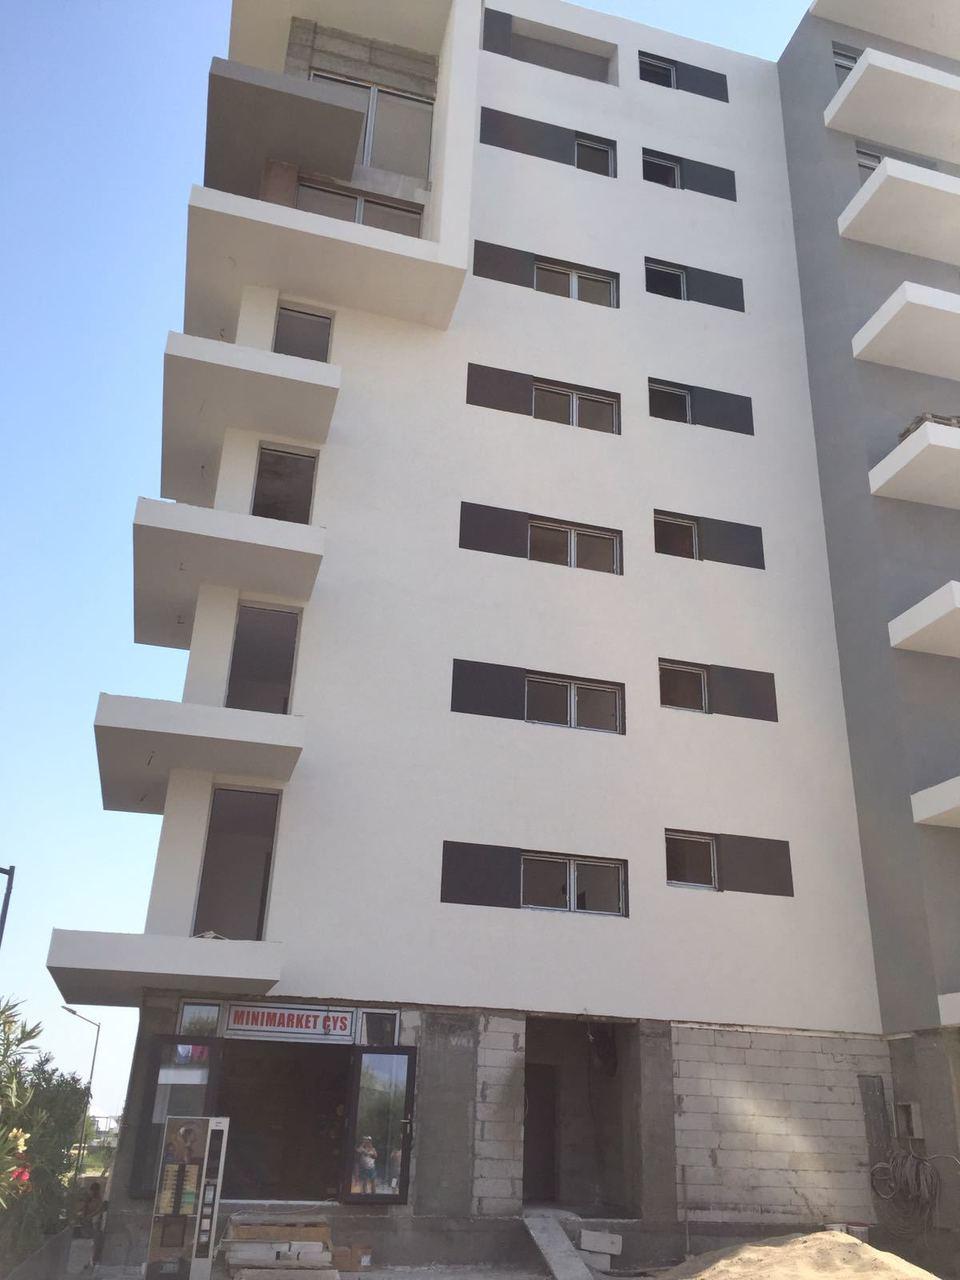 Asa arata blocul ridicat de familia Halep langa plaja